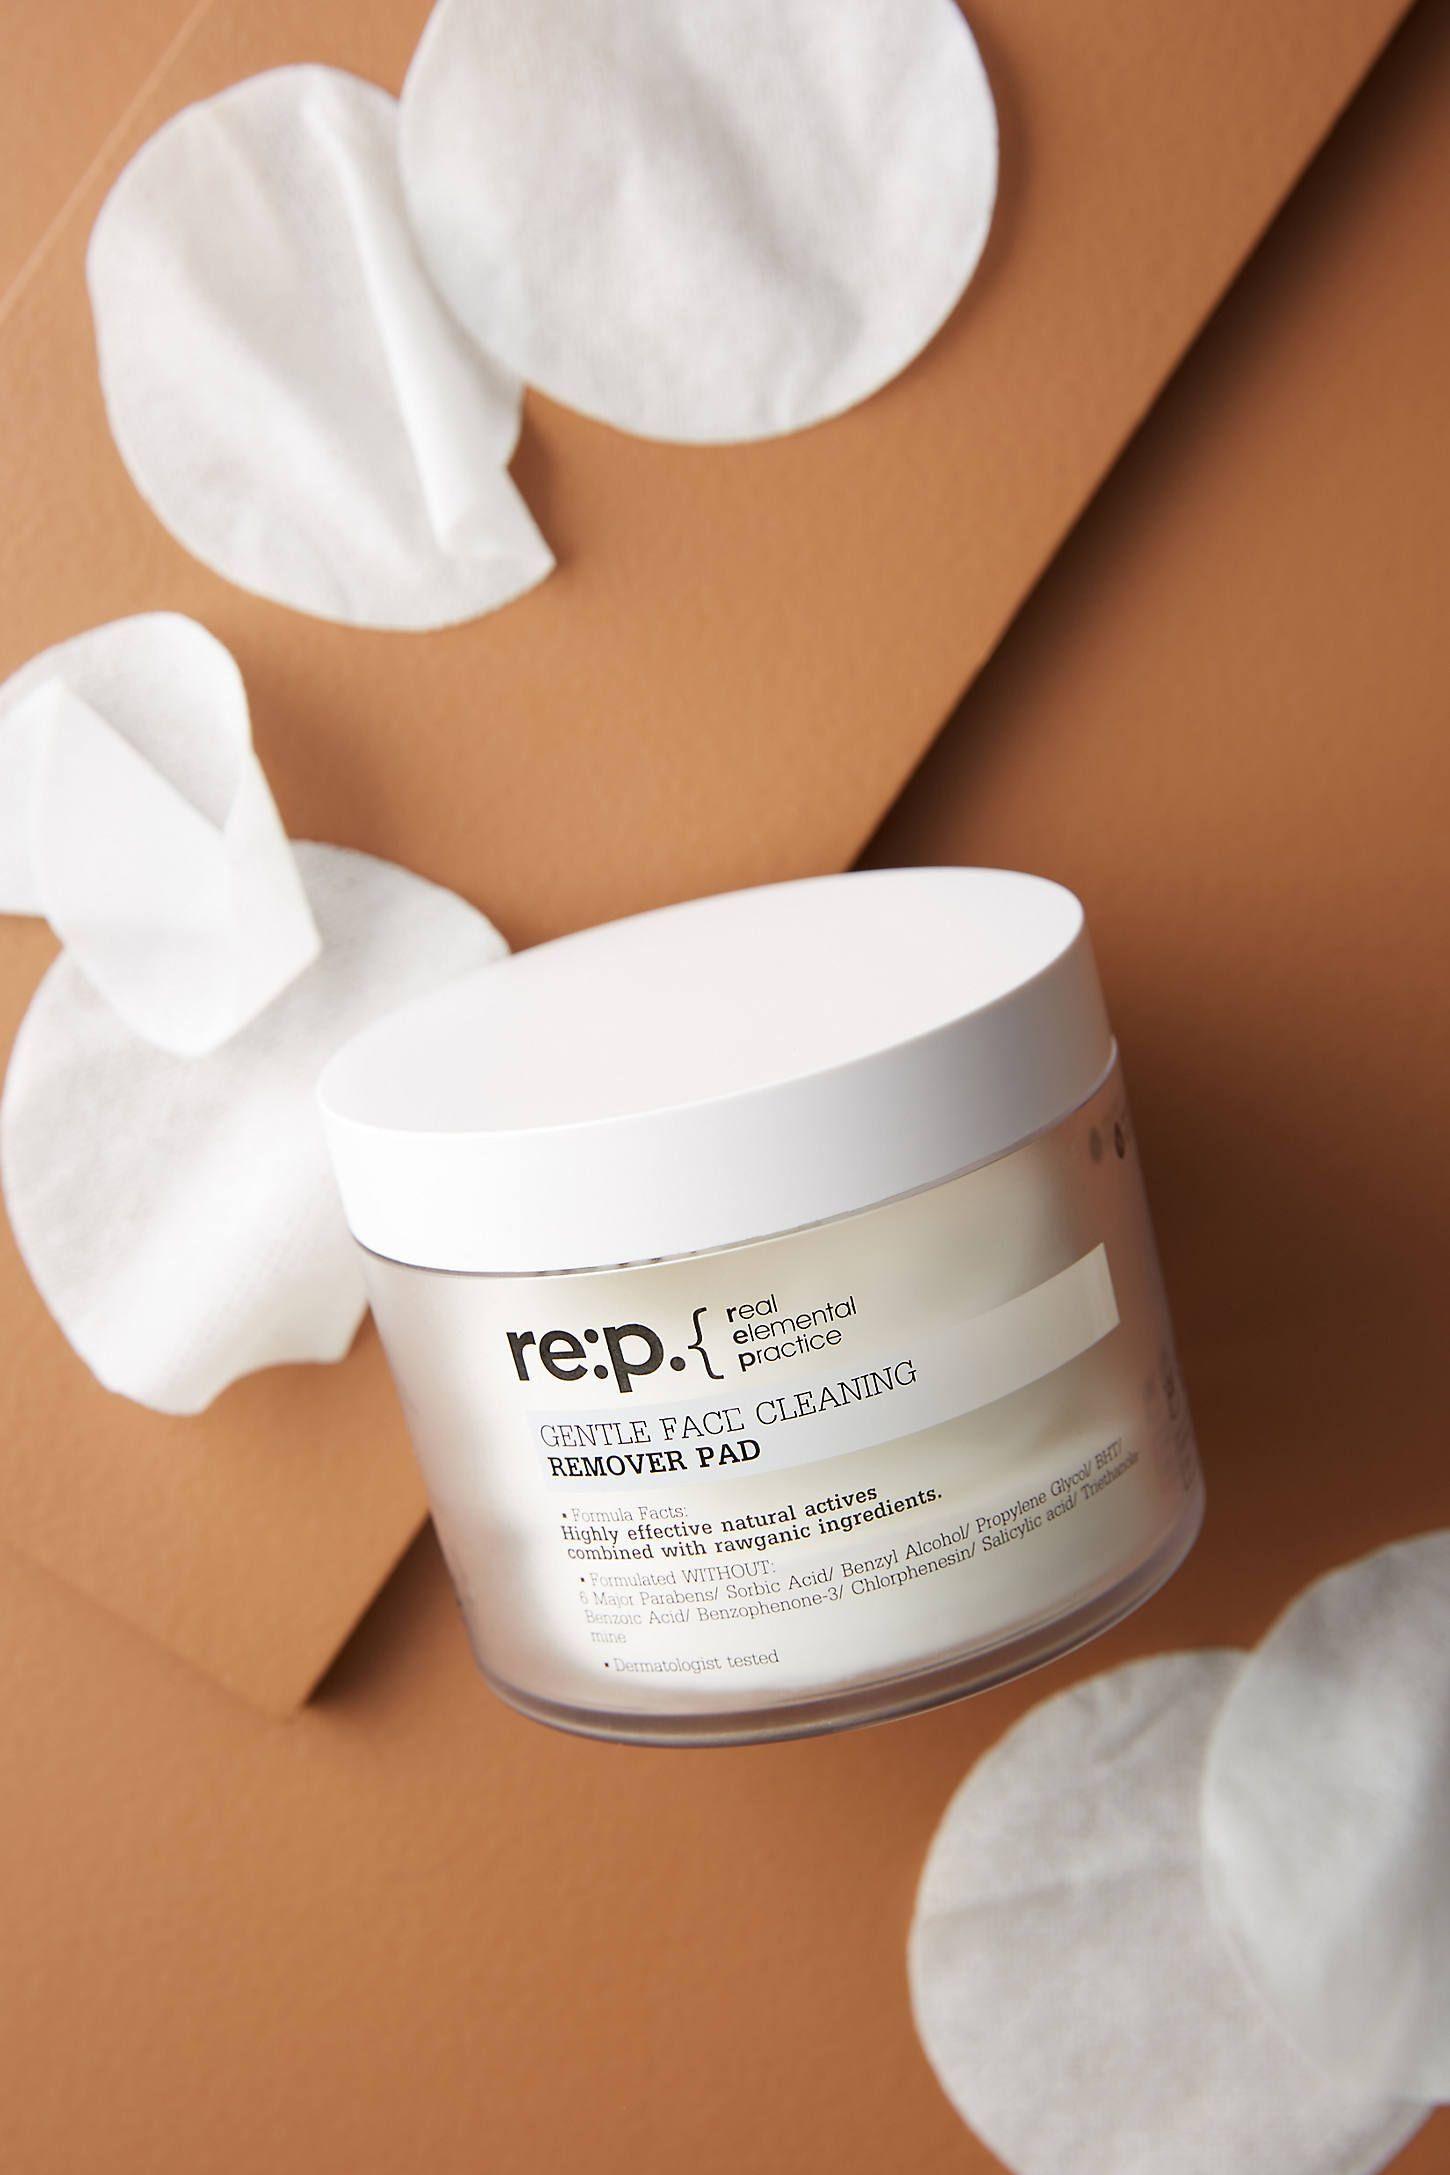 Tẩy trang Re:p dạng miếng Re:p Gentle Face Cleaning Remover Pad Hàn Quốc, 70 miếng